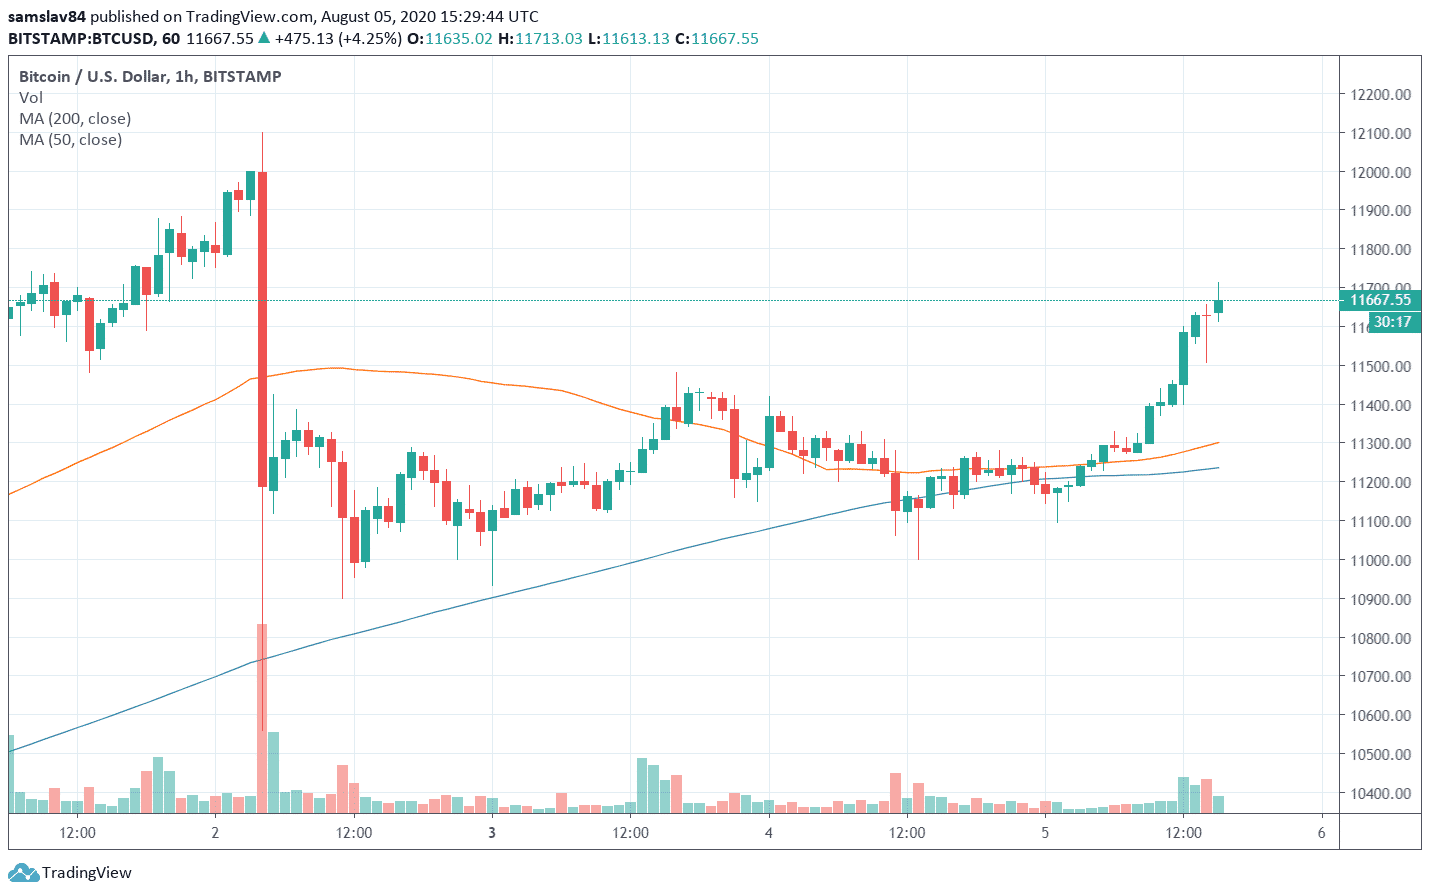 1h BTC / USD - bitstamp